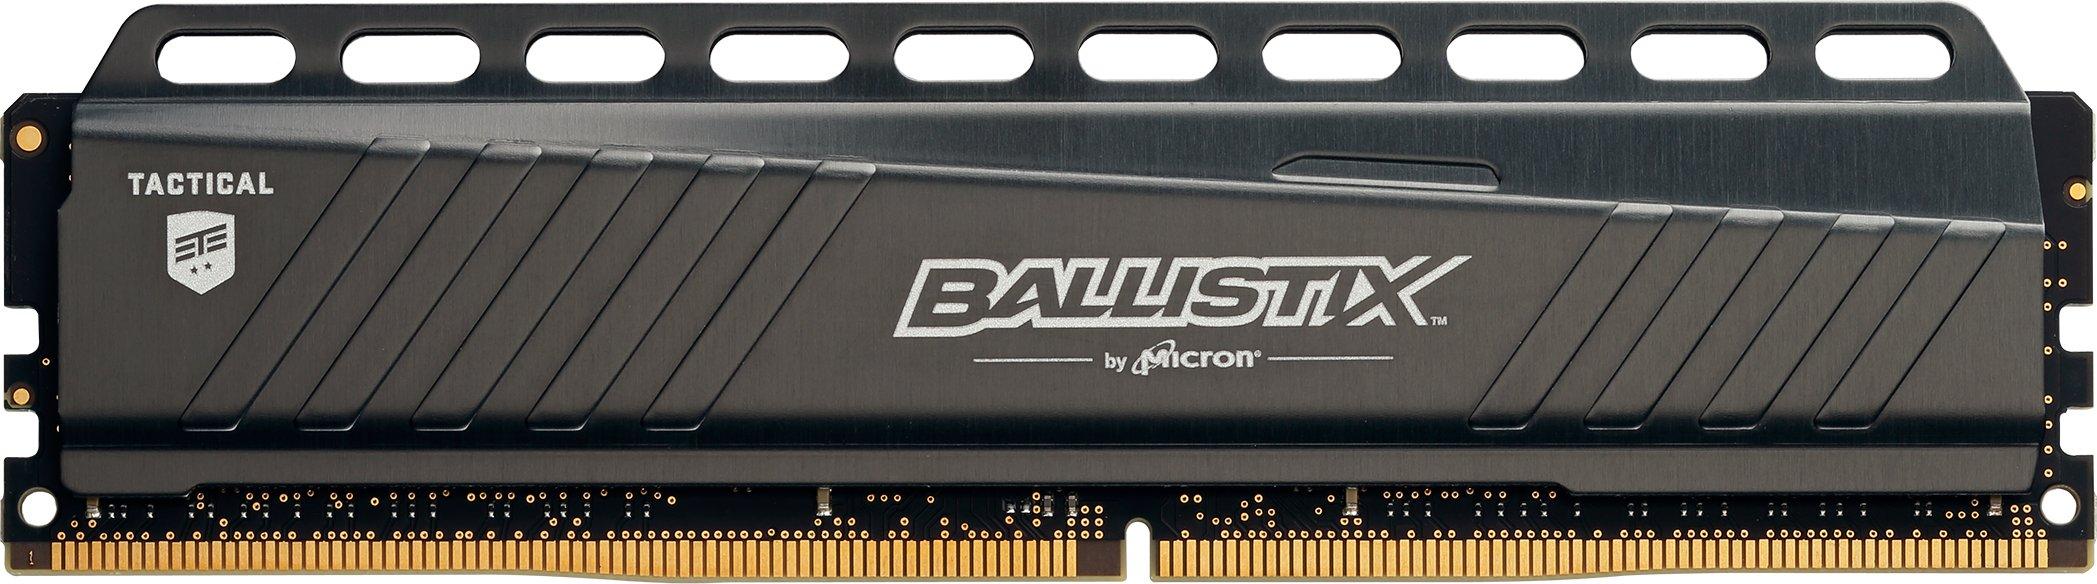 Ballistix Tactical 8GB Single DDR4 2666 MT/s (PC4-21300) DIMM 288-Pin Memory - BLT8G4D26AFTA